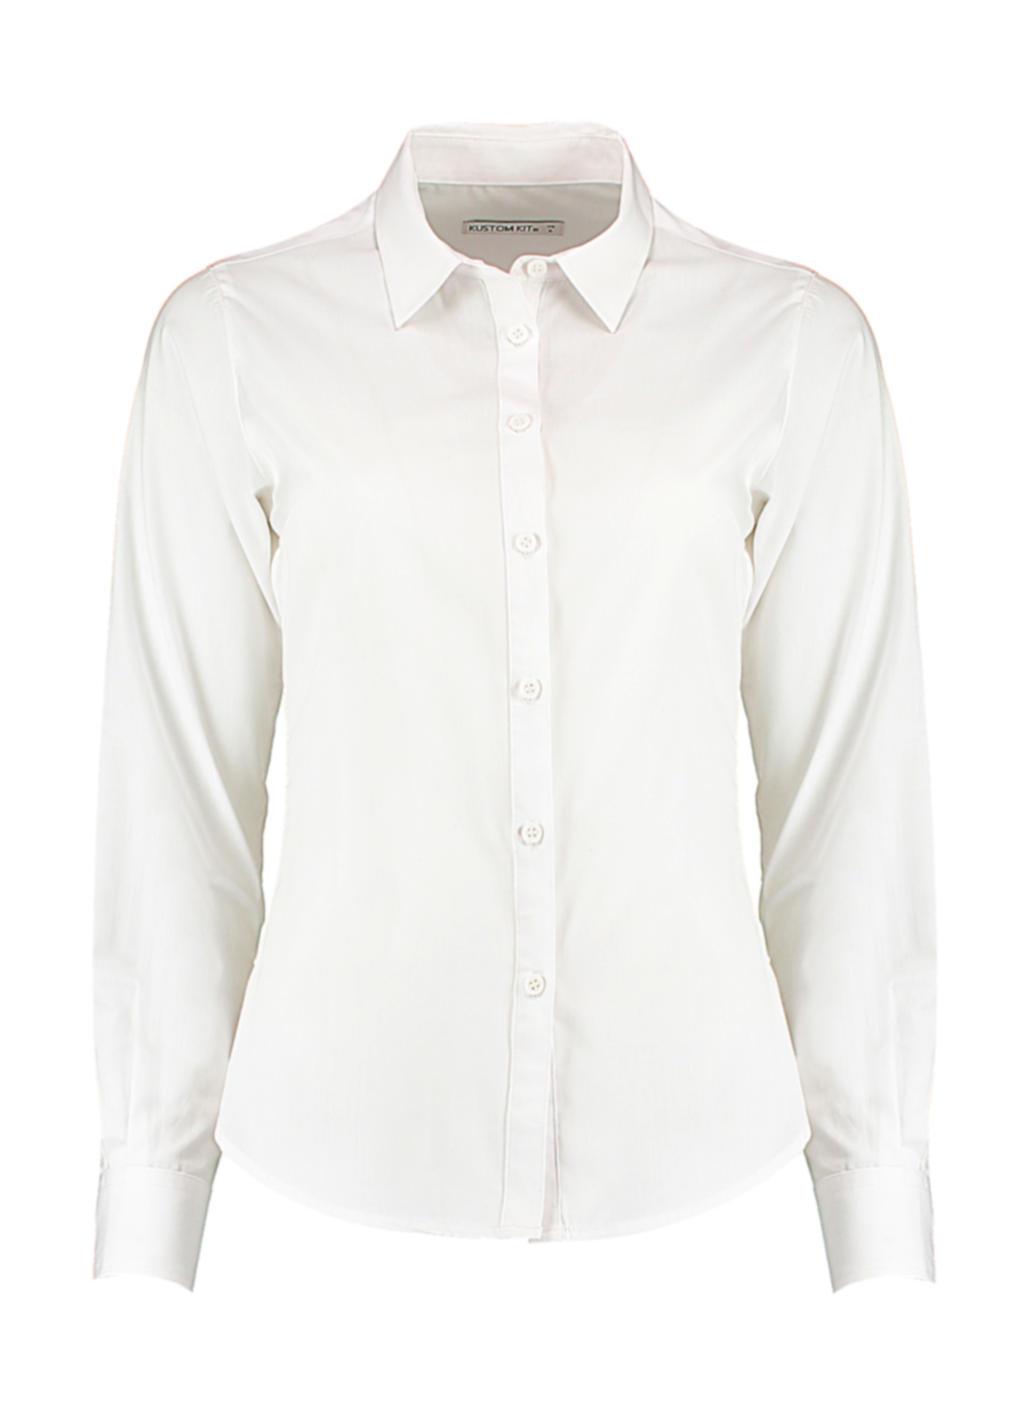 Women's Tailored Fit Poplin Shirt